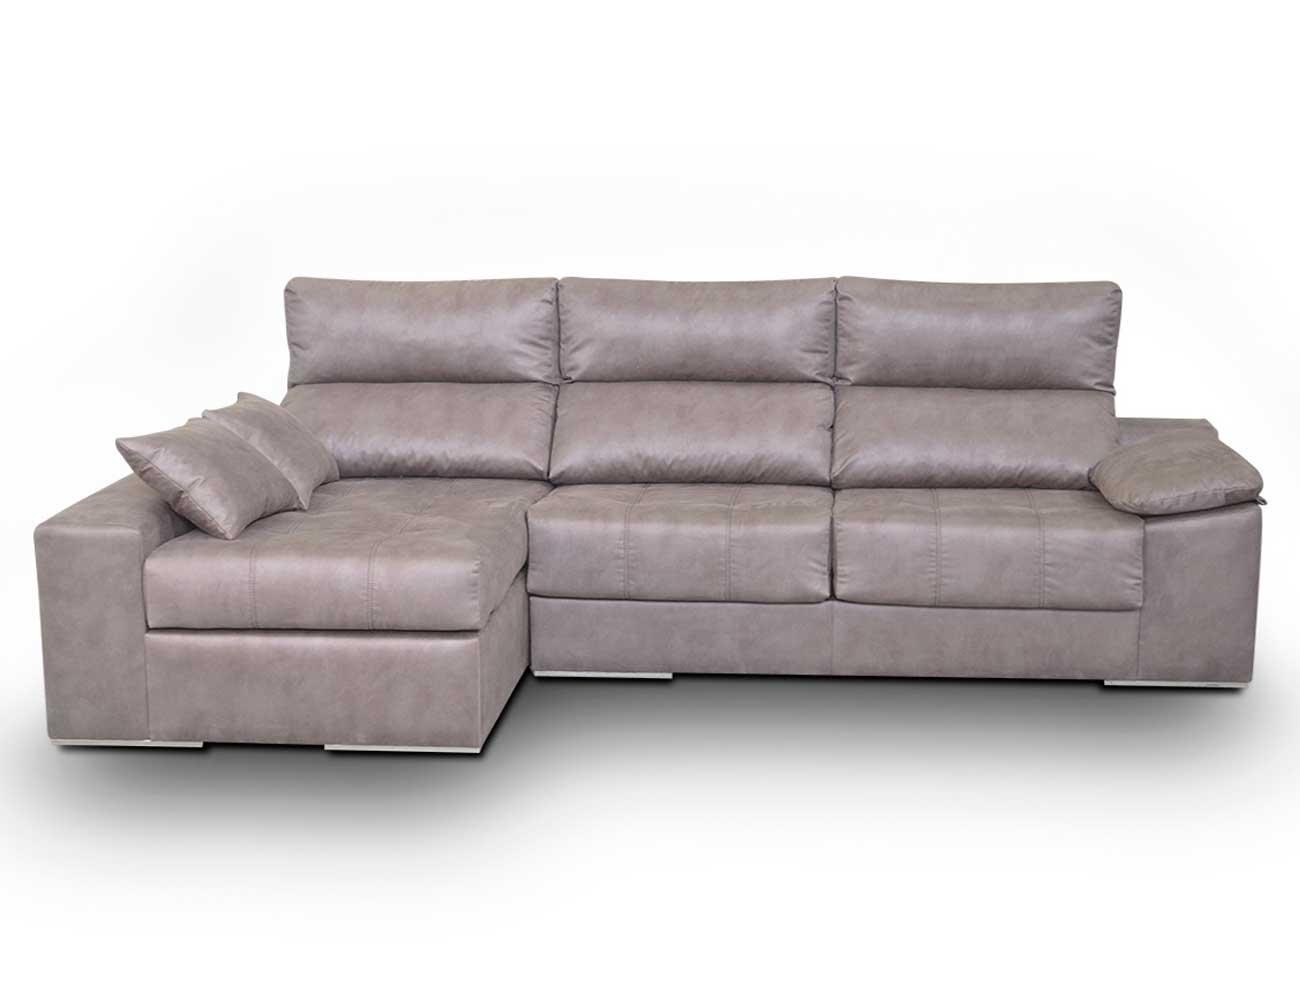 4938_sofa chaiselongue moderno asientos extraibles muy comodo dobles pespuntes donatella2